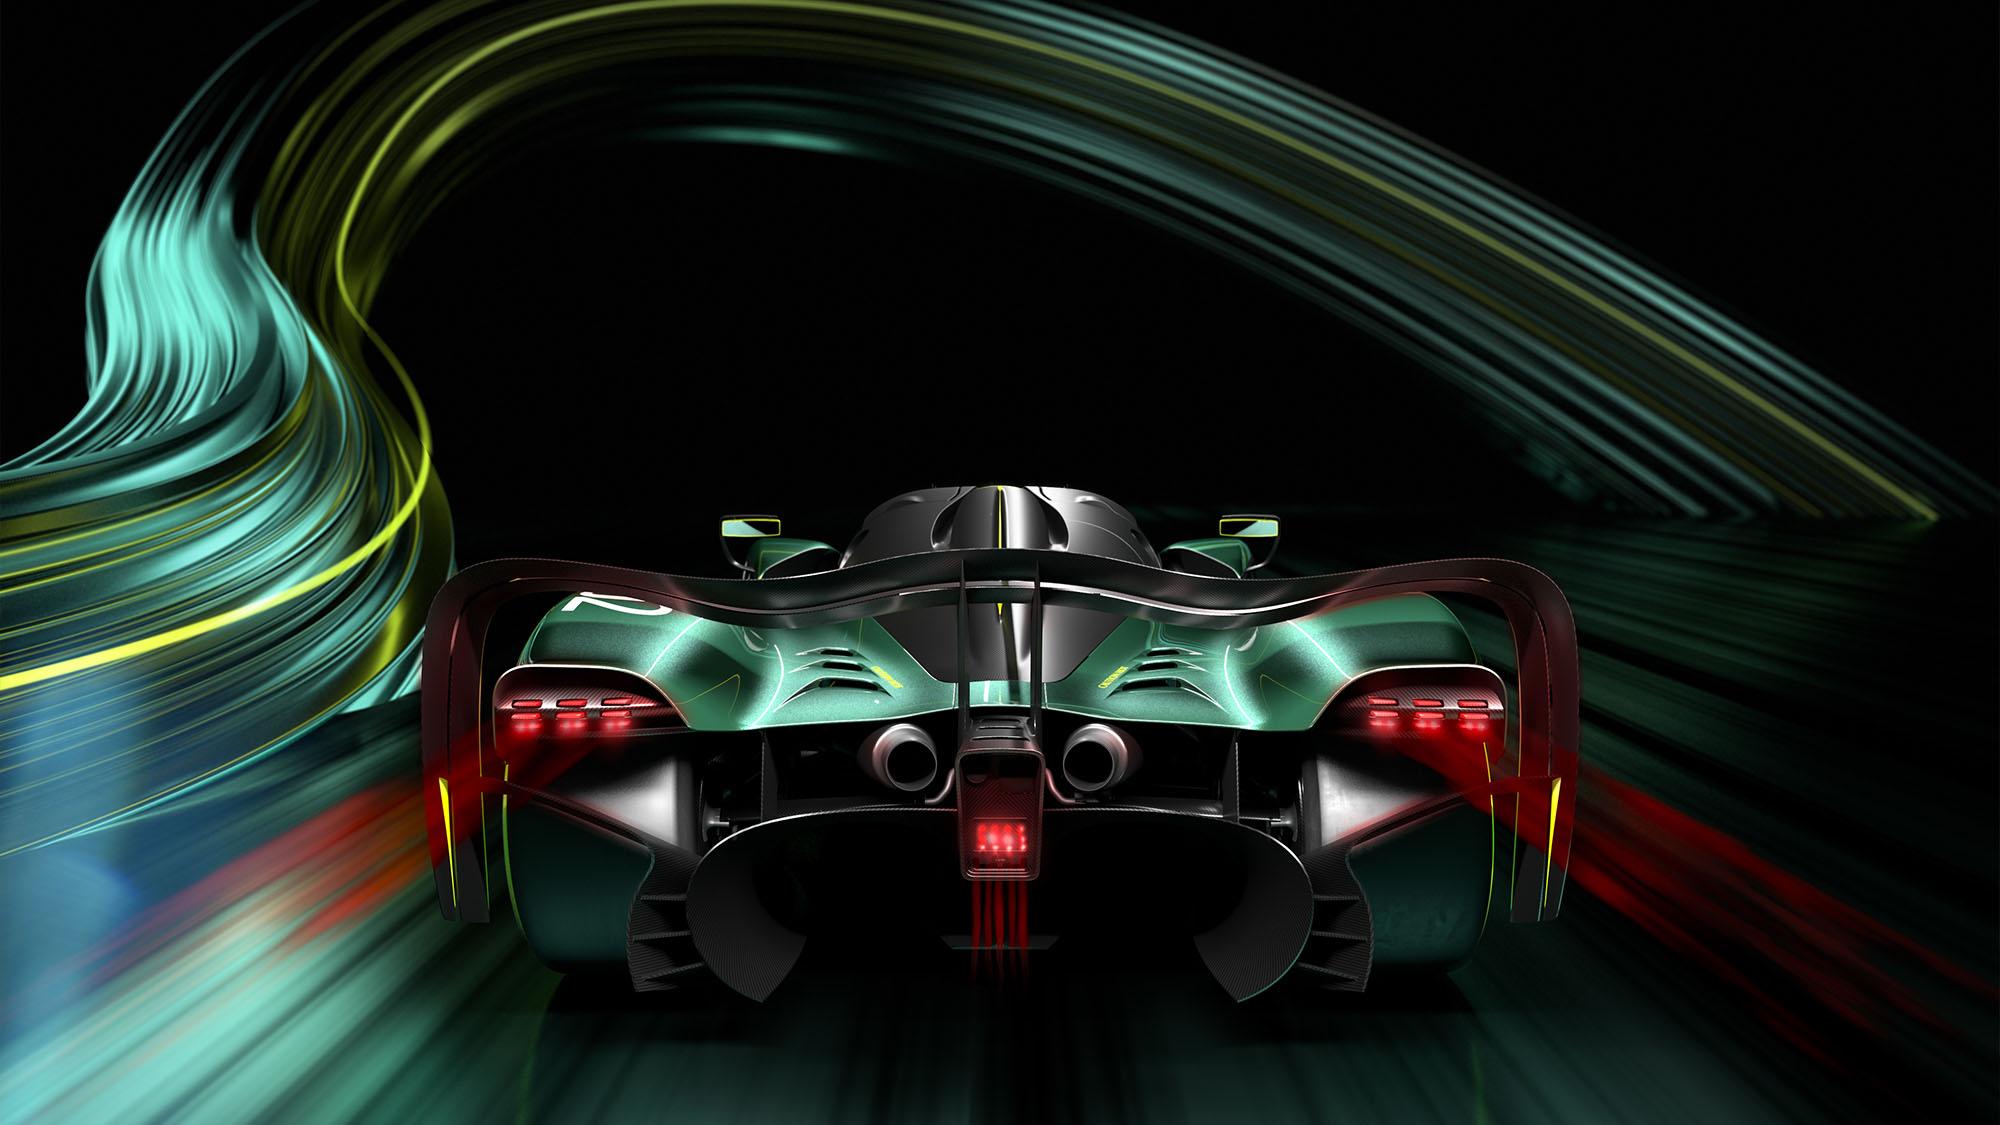 Aston Martin Valkyrie AMR Pro rear